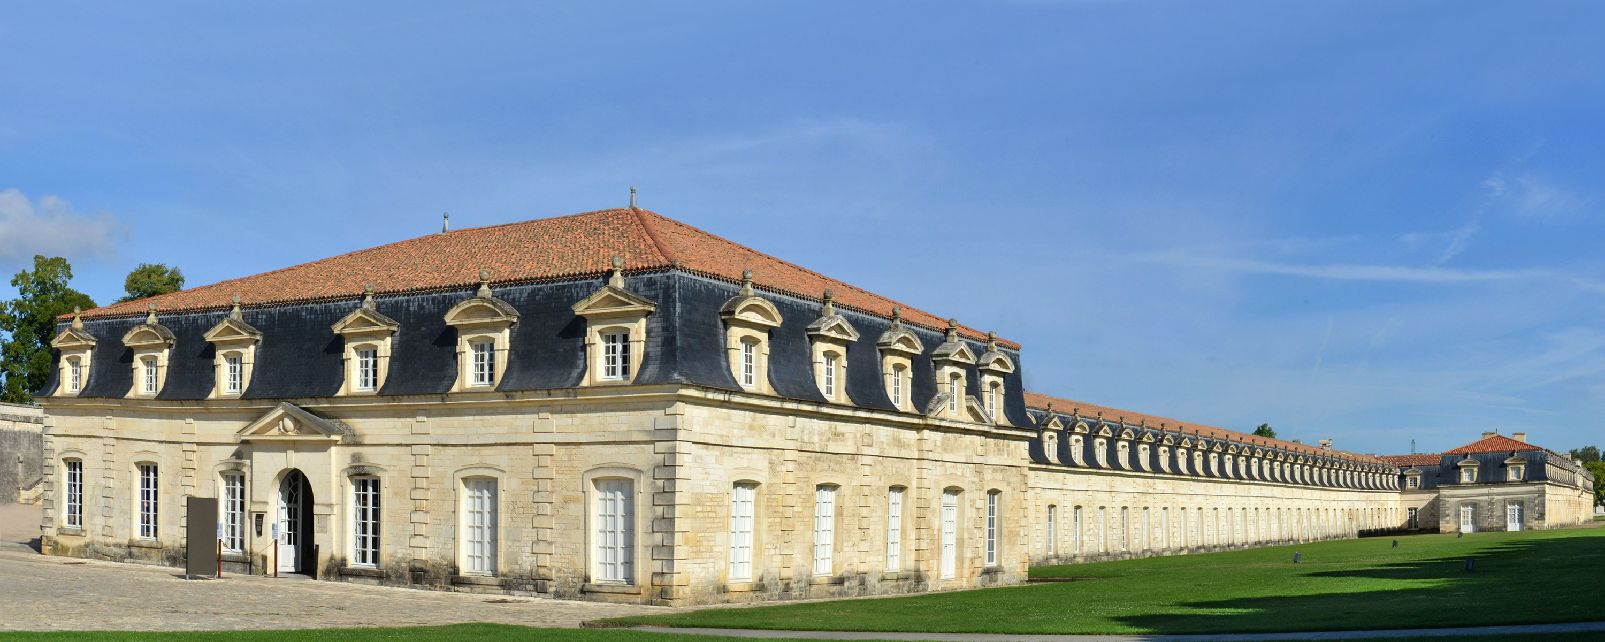 La corderie de Rochefort , France